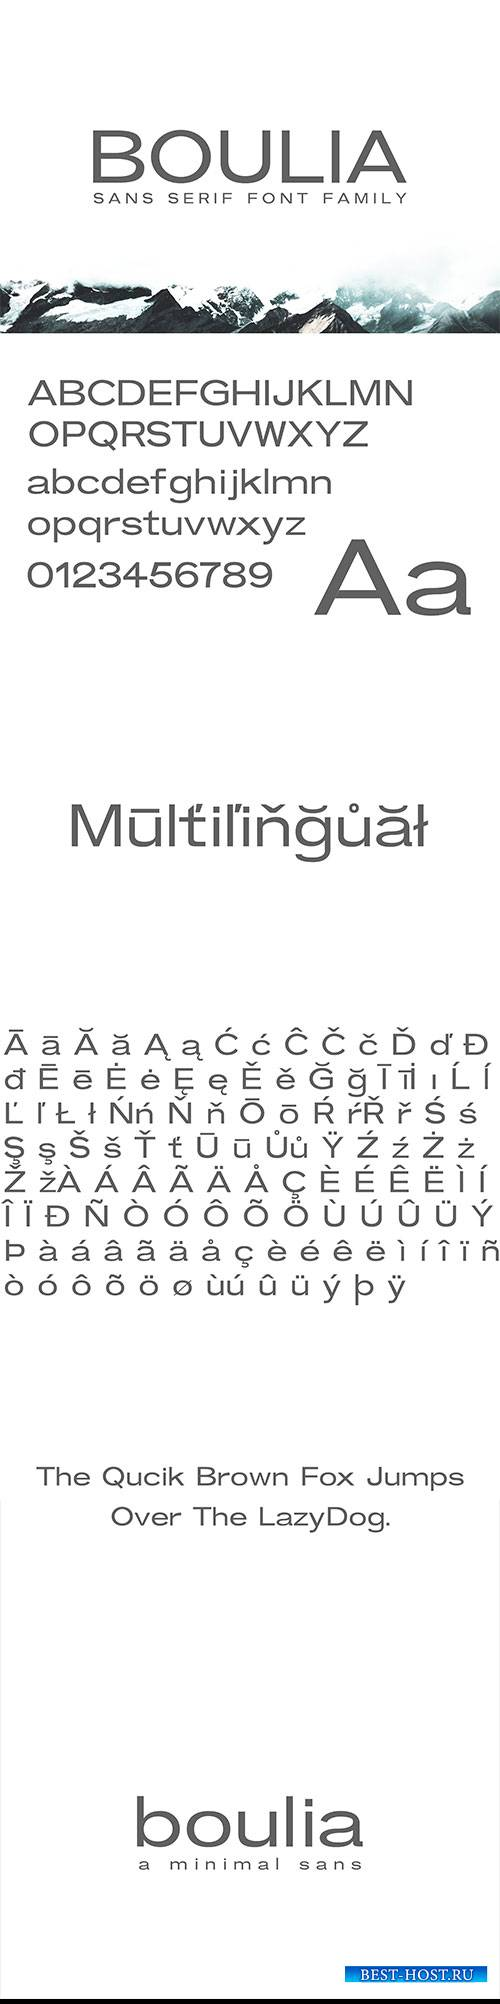 CM - Boulia Sans Serif Font Family 2912151